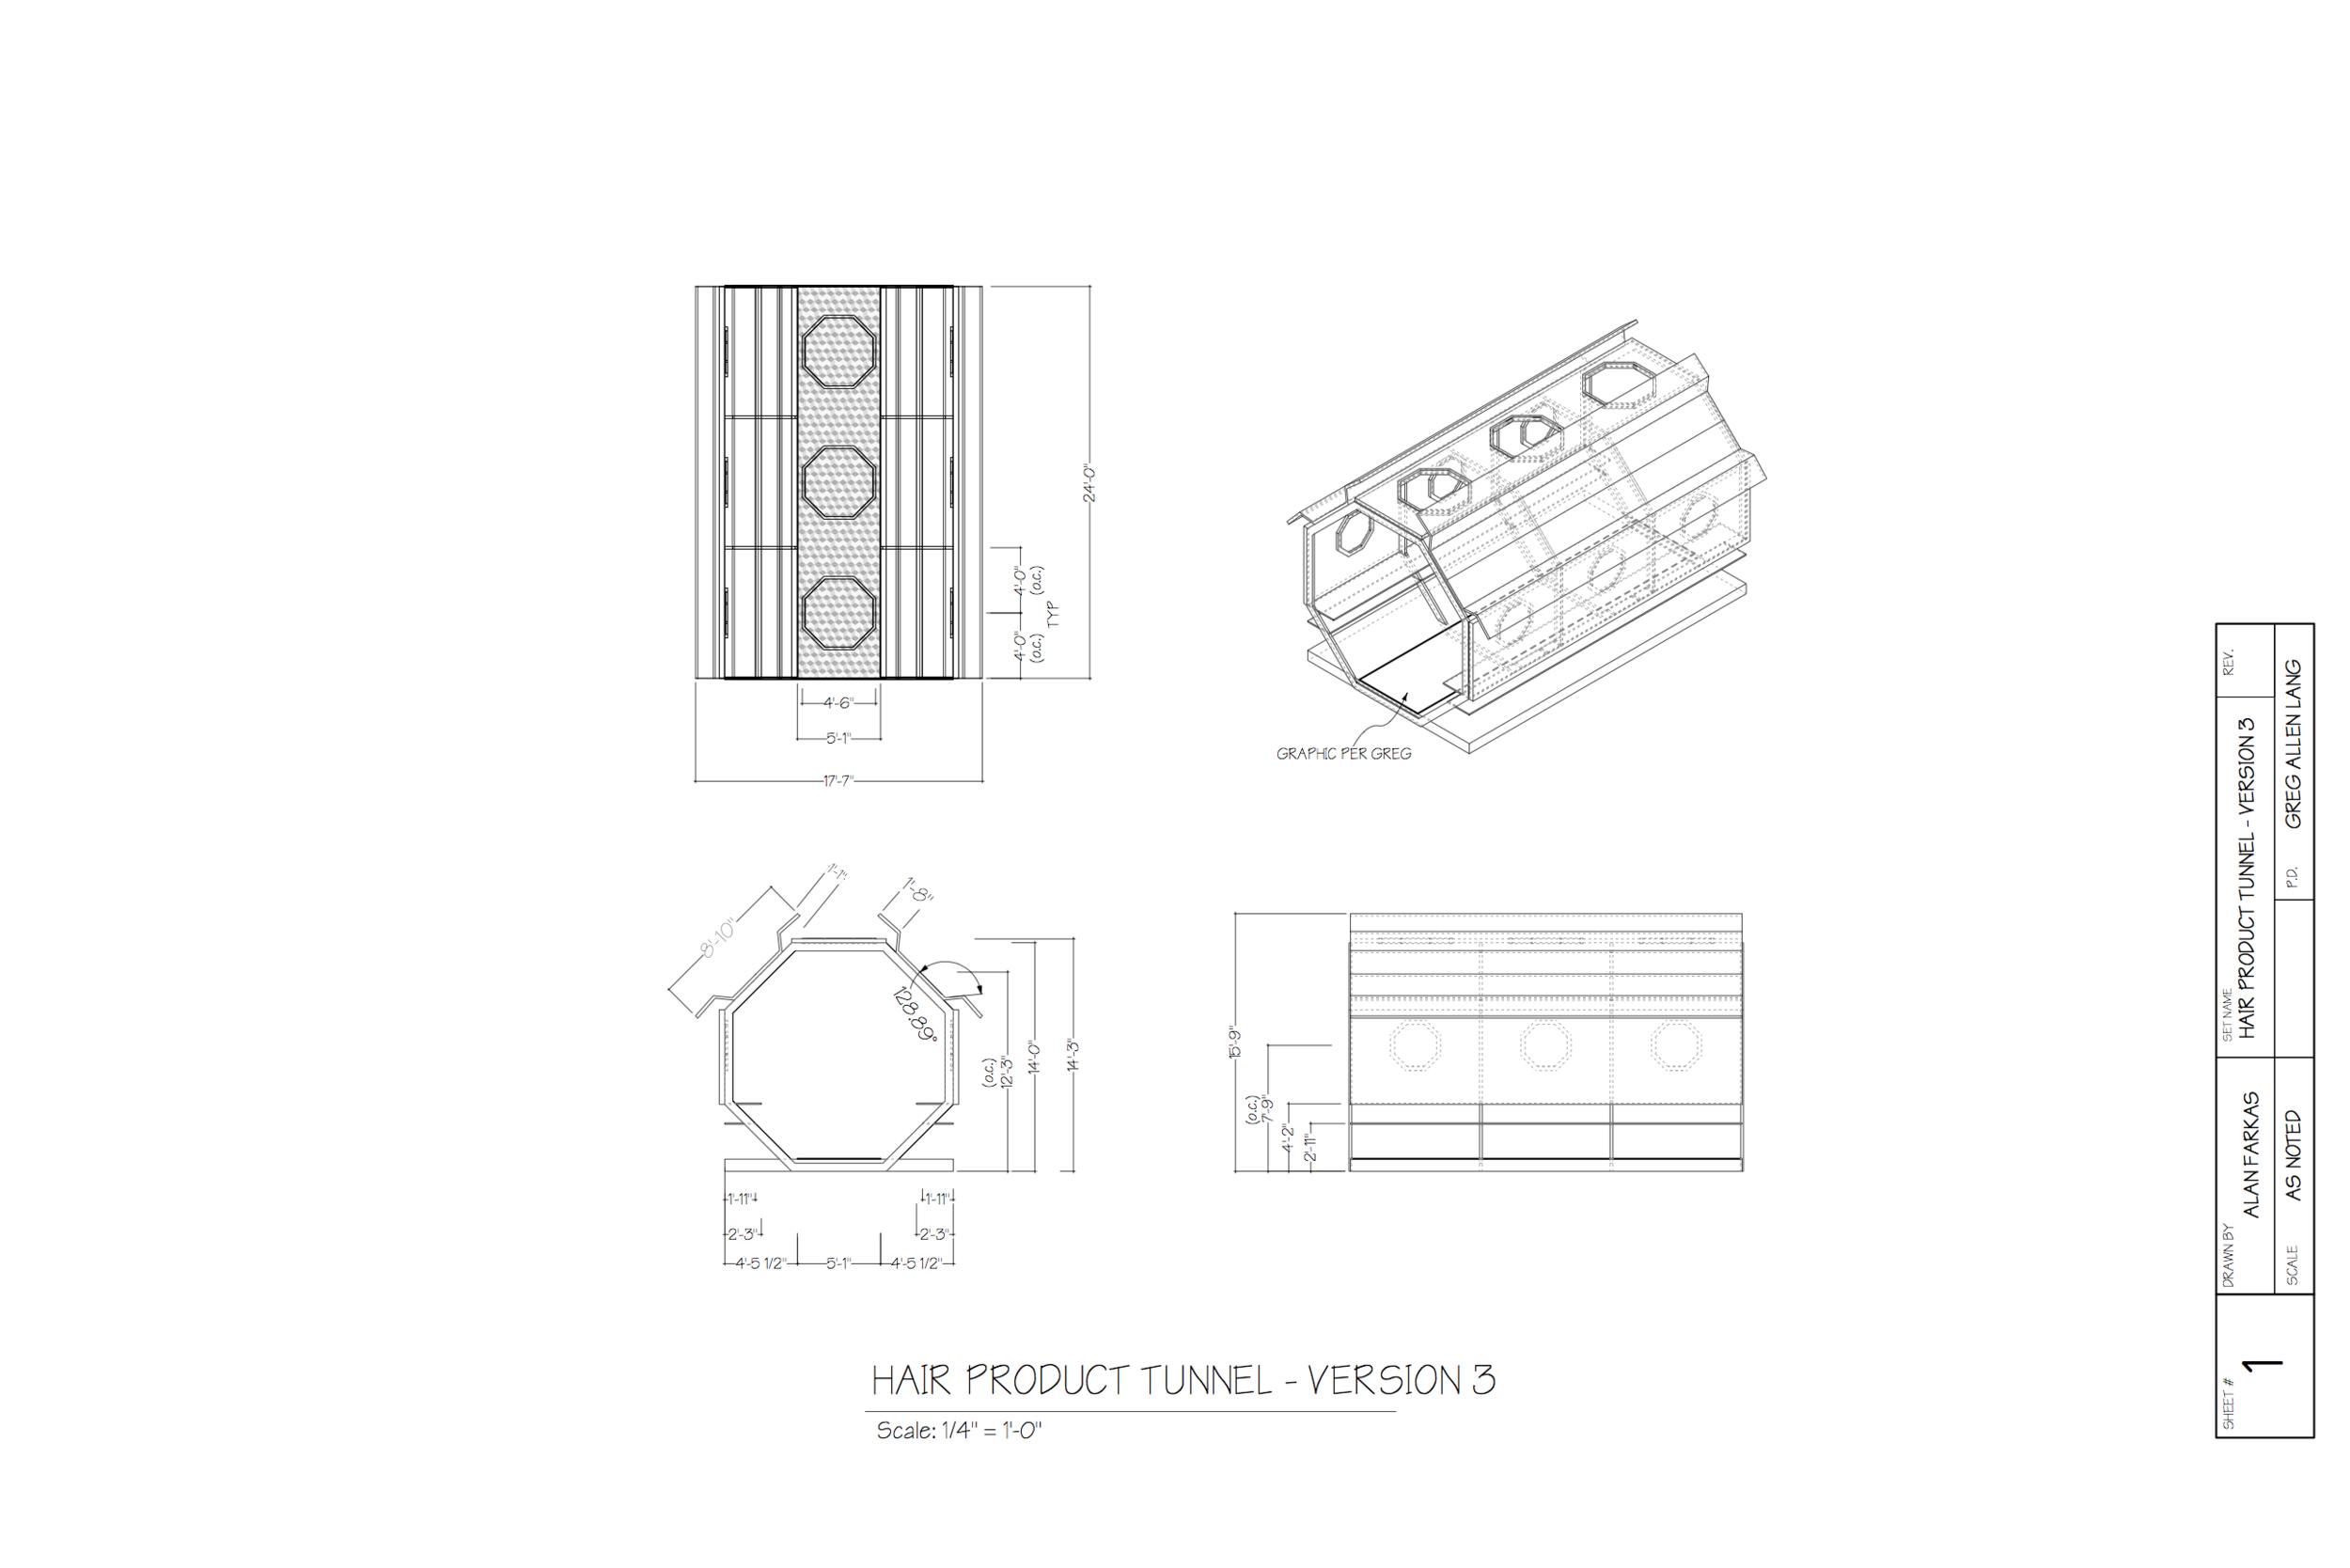 ULTA_B-Tunnel Version 3.png